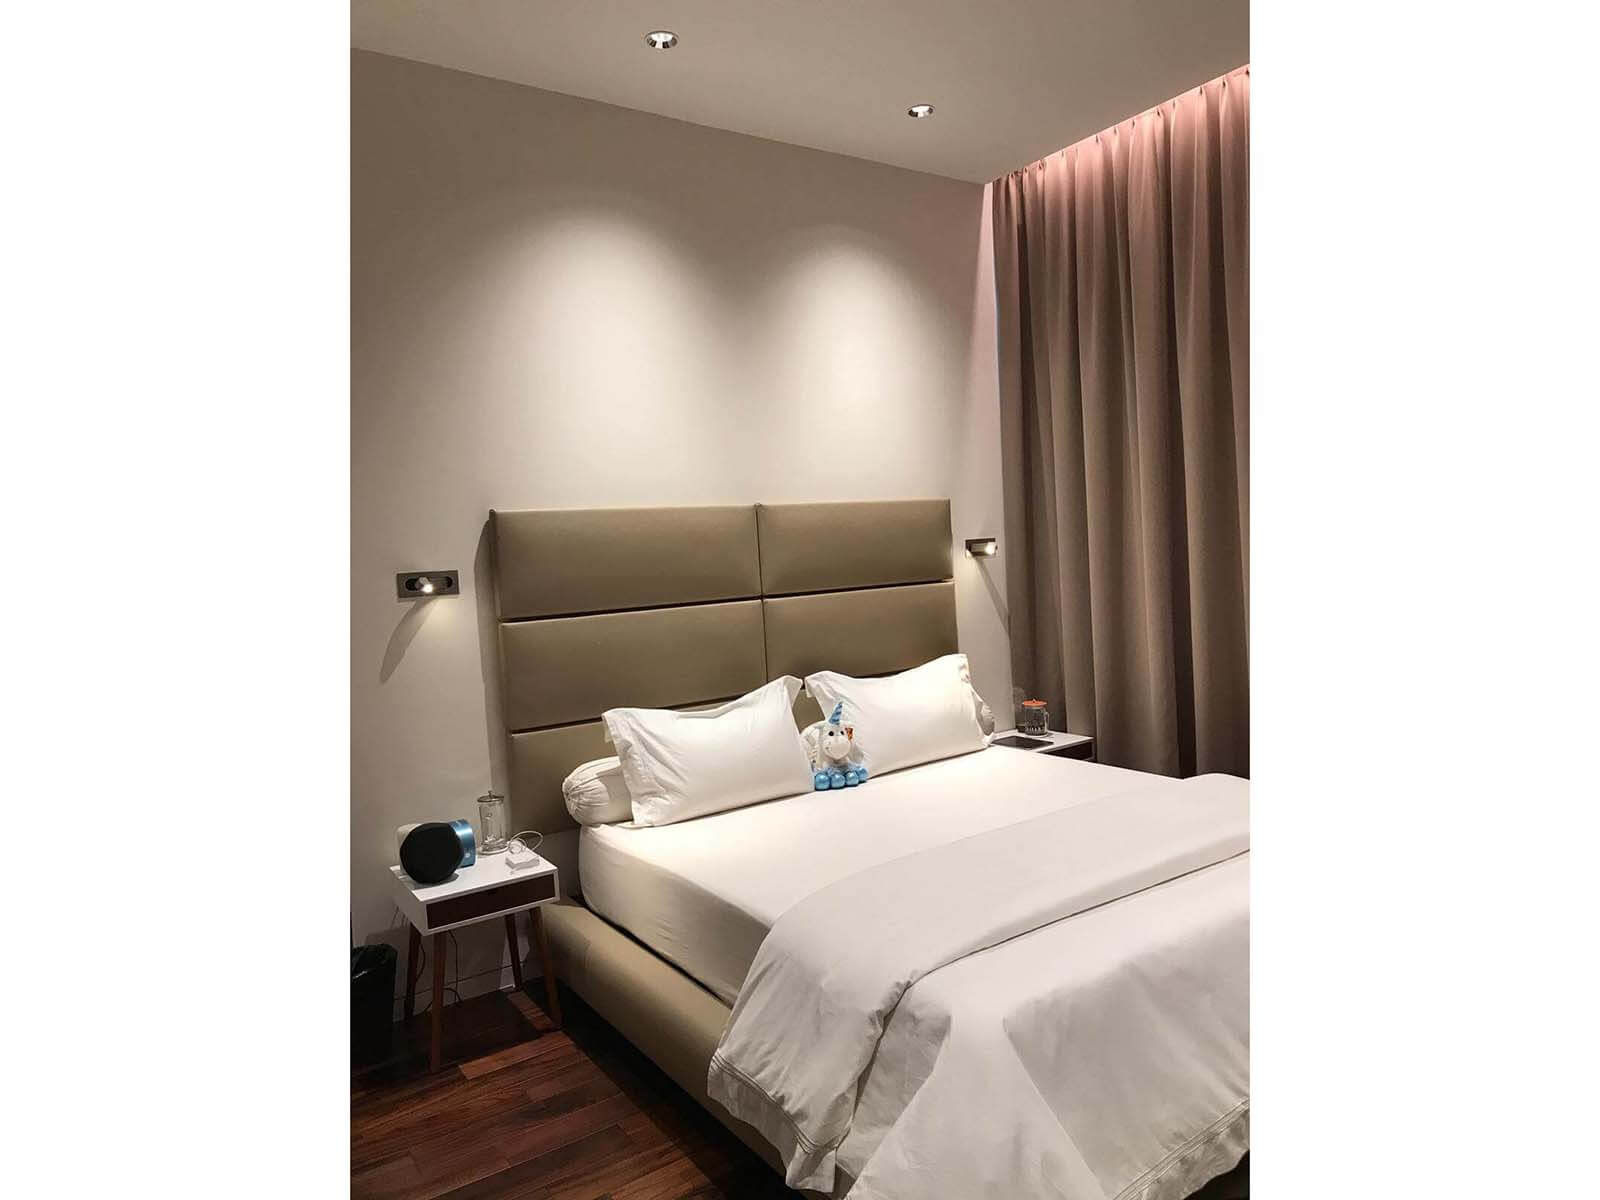 7A Swettenham ham Residential bedroom lighting project2